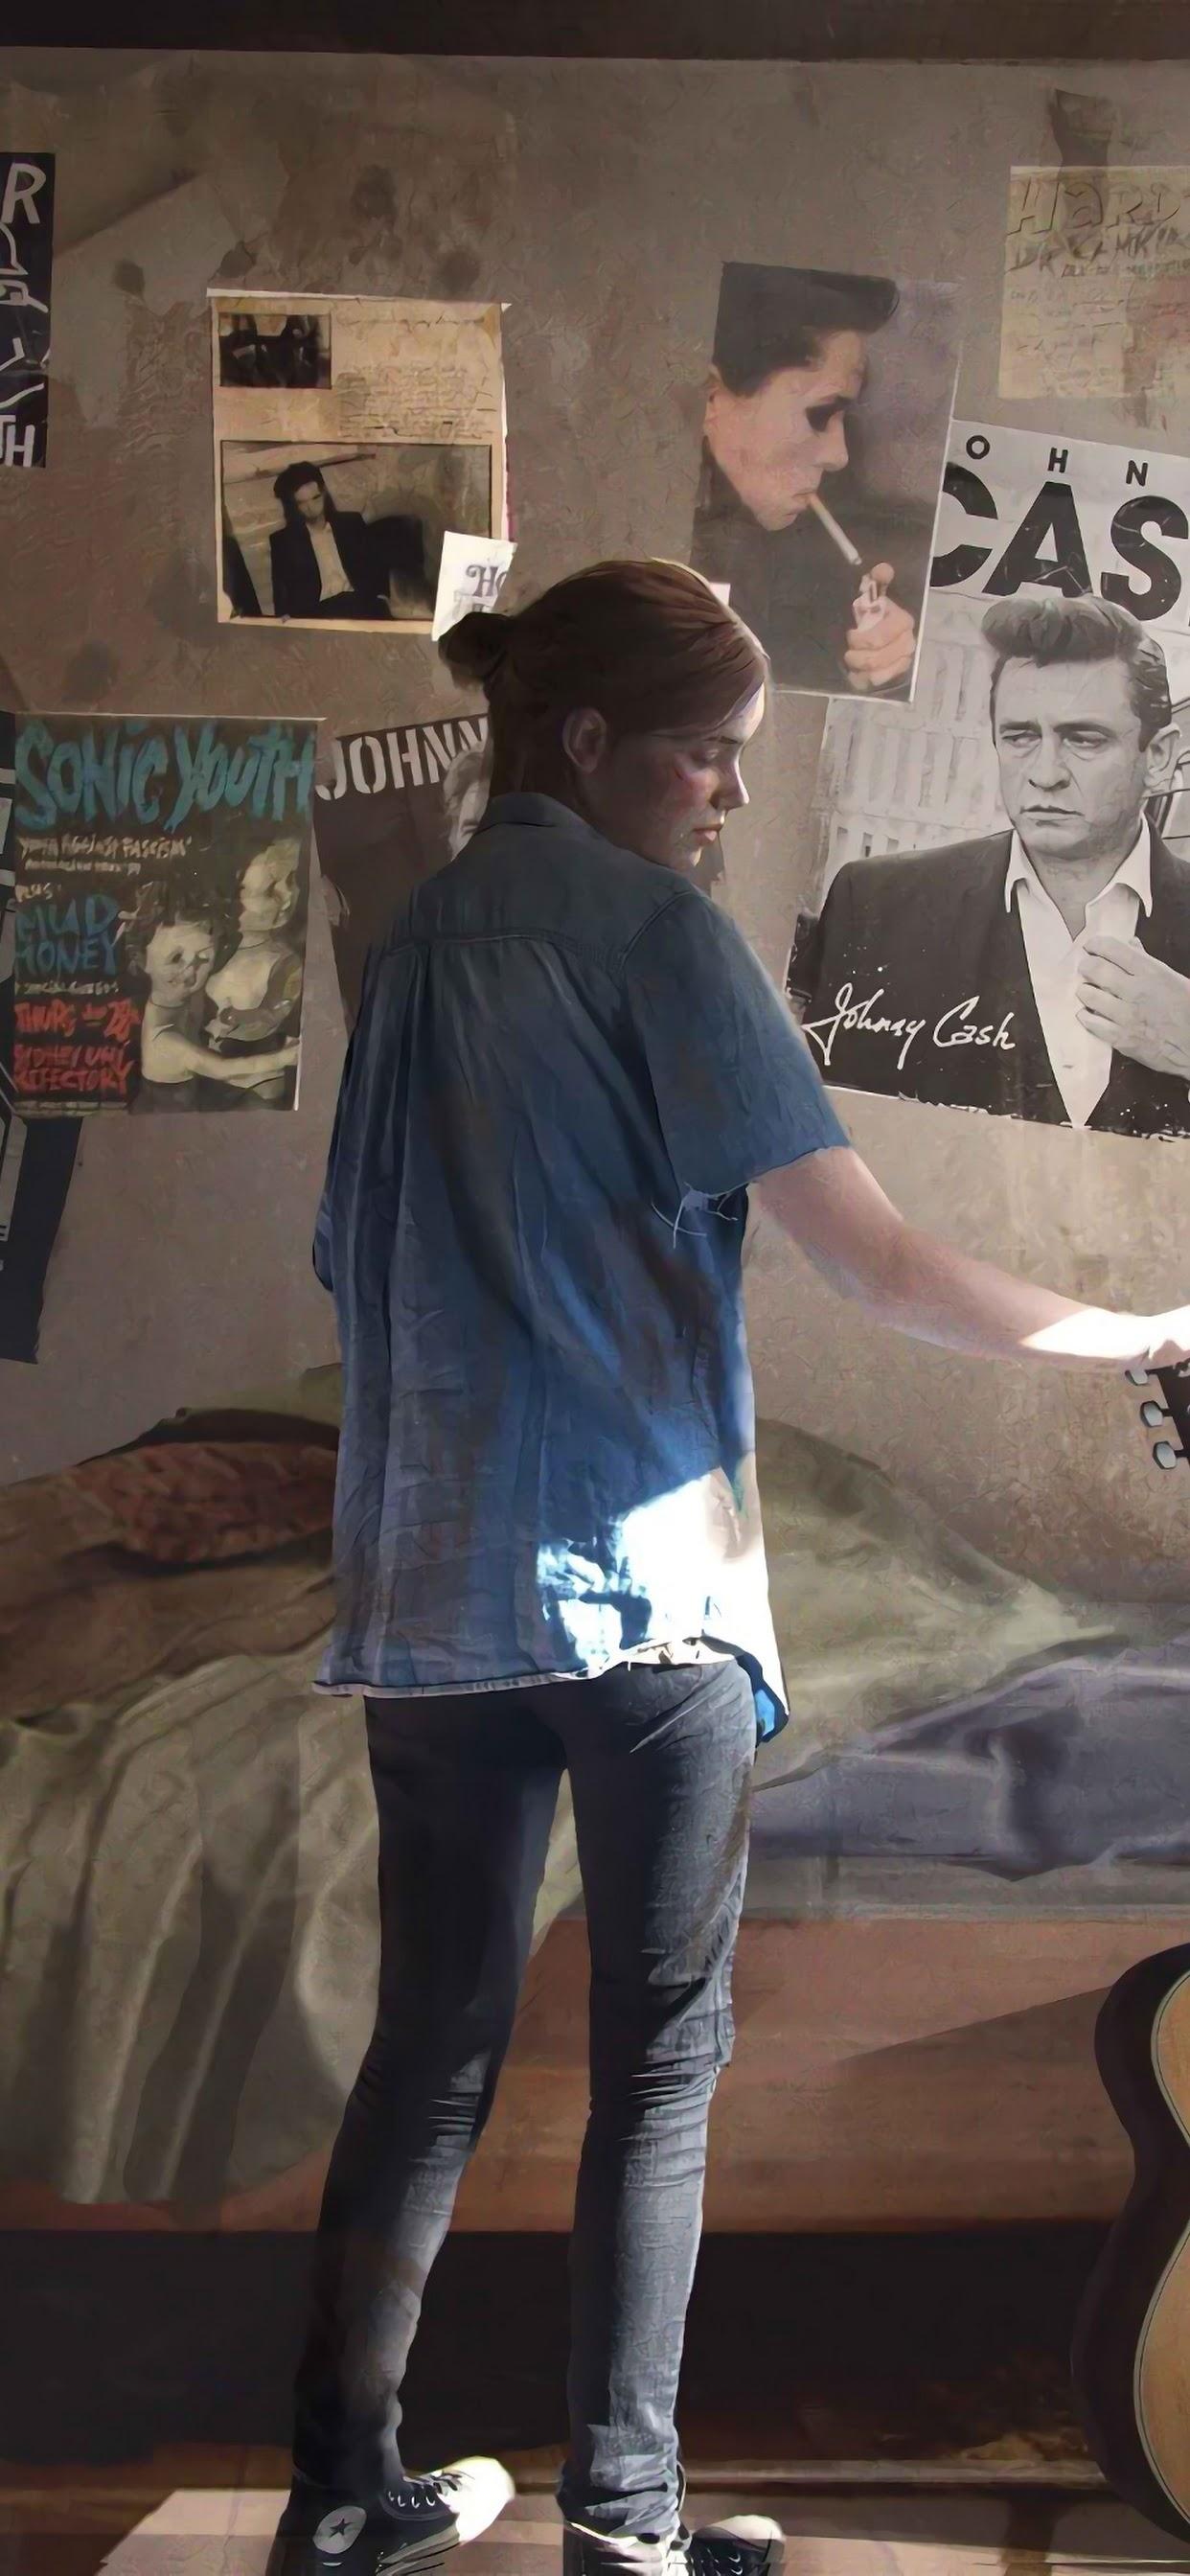 The Last Of Us Part 2, Ellie, Guitar, 4k, - Ellie The Last Of Us Part 2 - HD Wallpaper